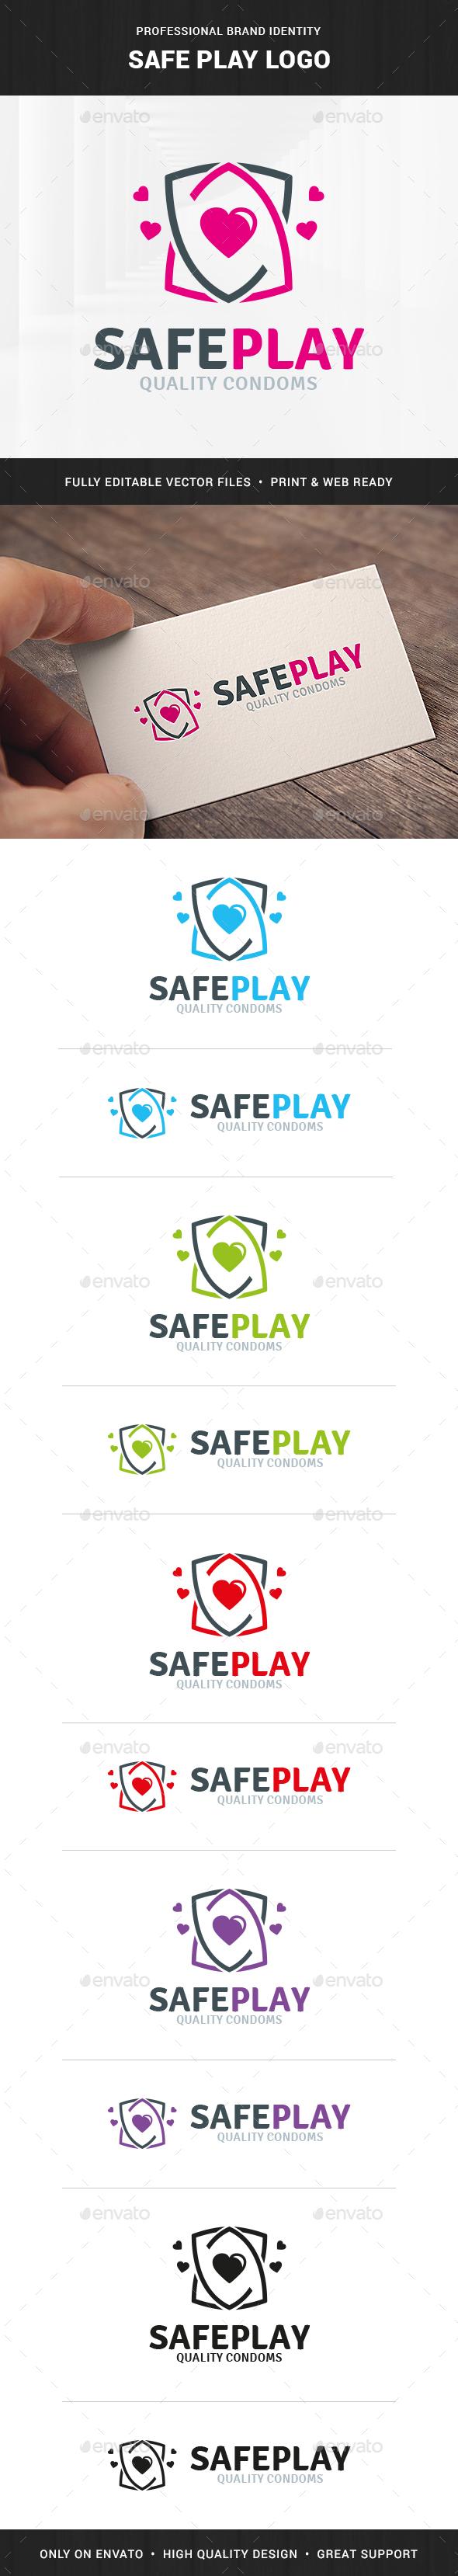 Safe Play Logo Template